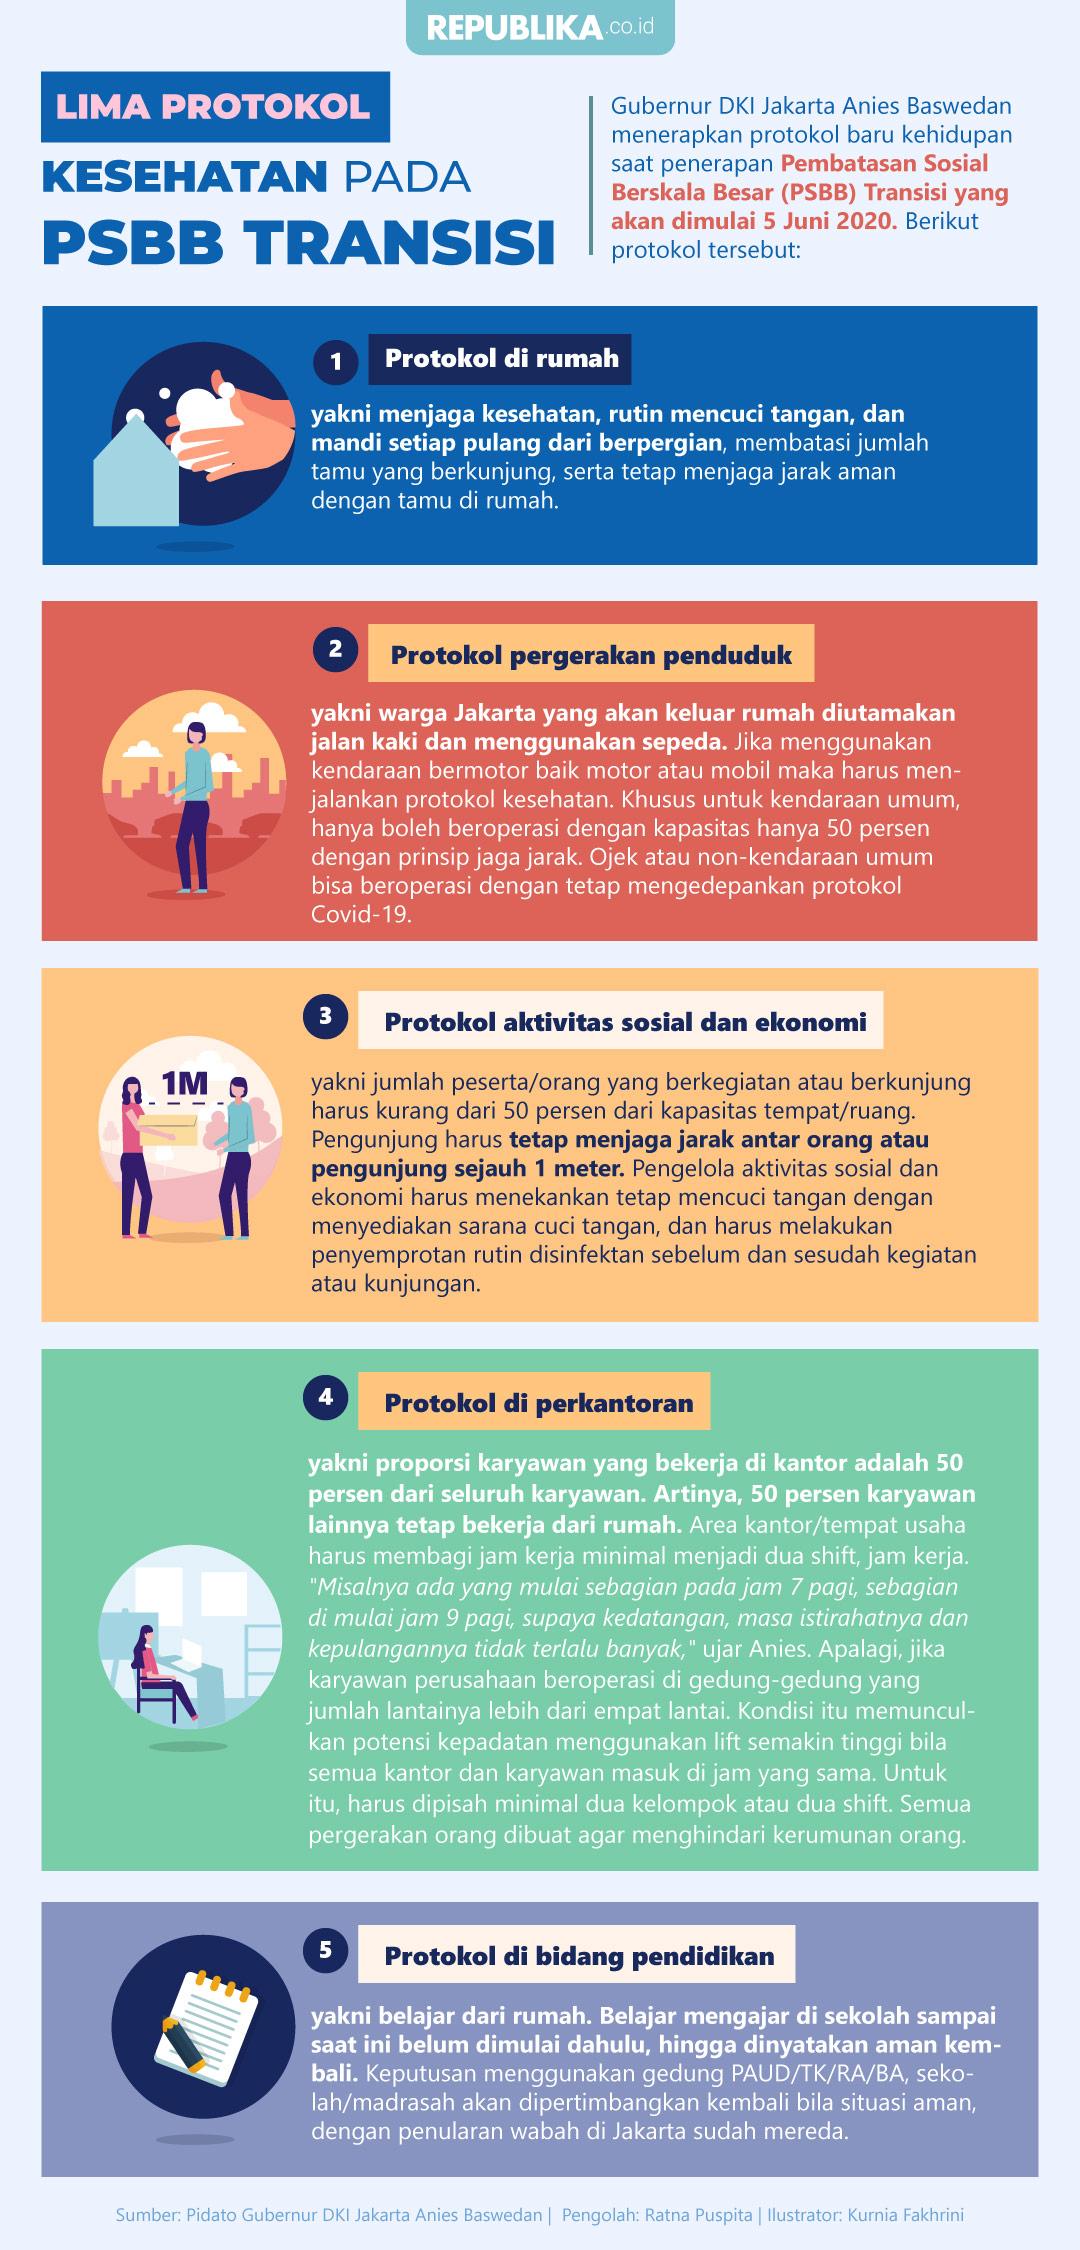 Infografis Lima Protokol Kesehatan Pada Psbb Transisi Republika Online